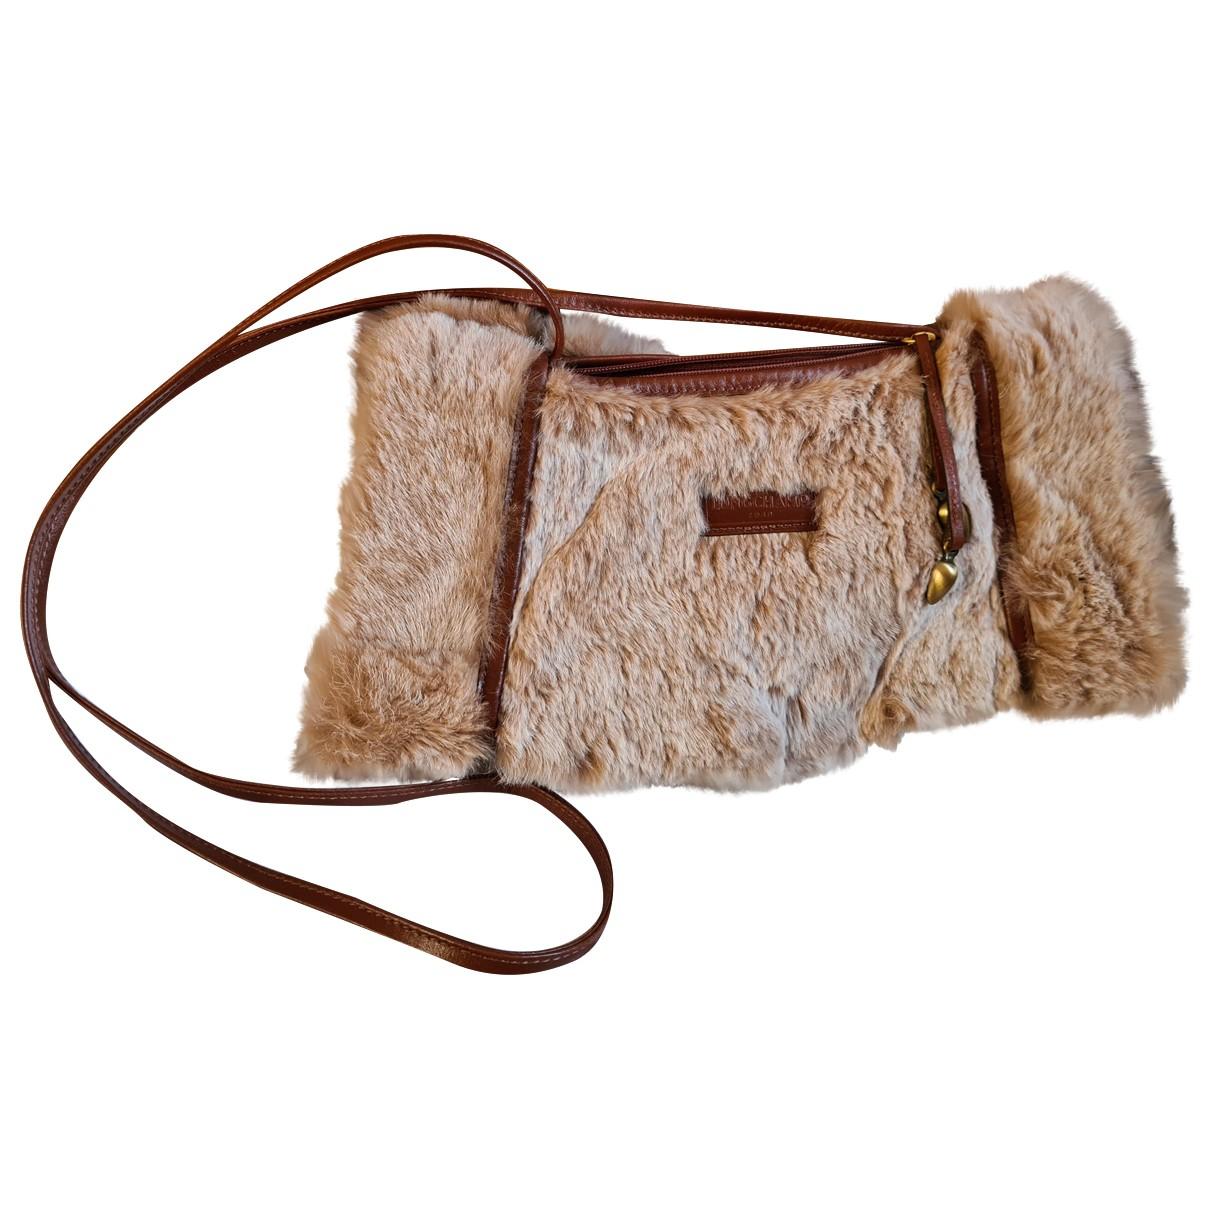 Longchamp \N Handtasche in  Braun Synthetikpelz